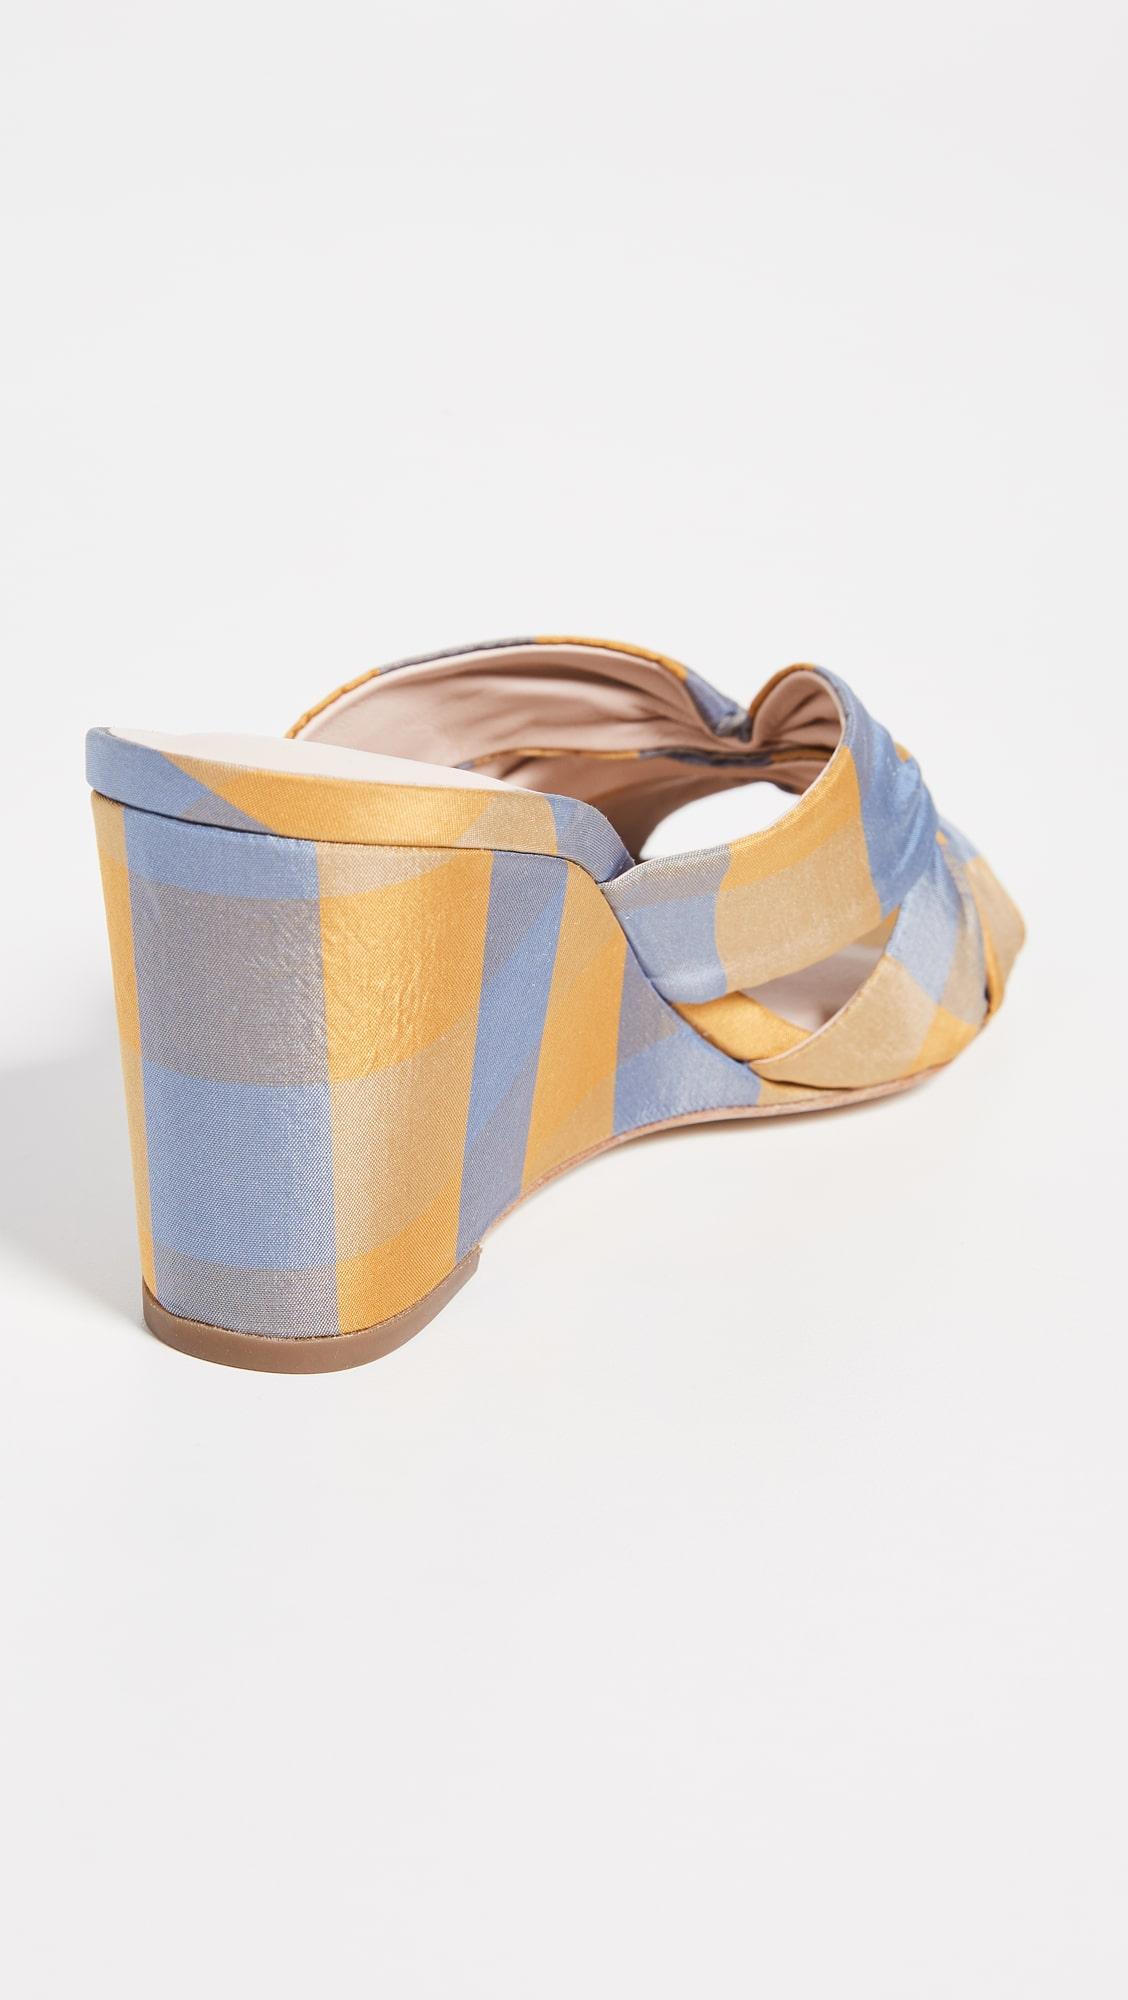 Loeffler Randall Sonya cinched wedge sandal at  shopbop.com